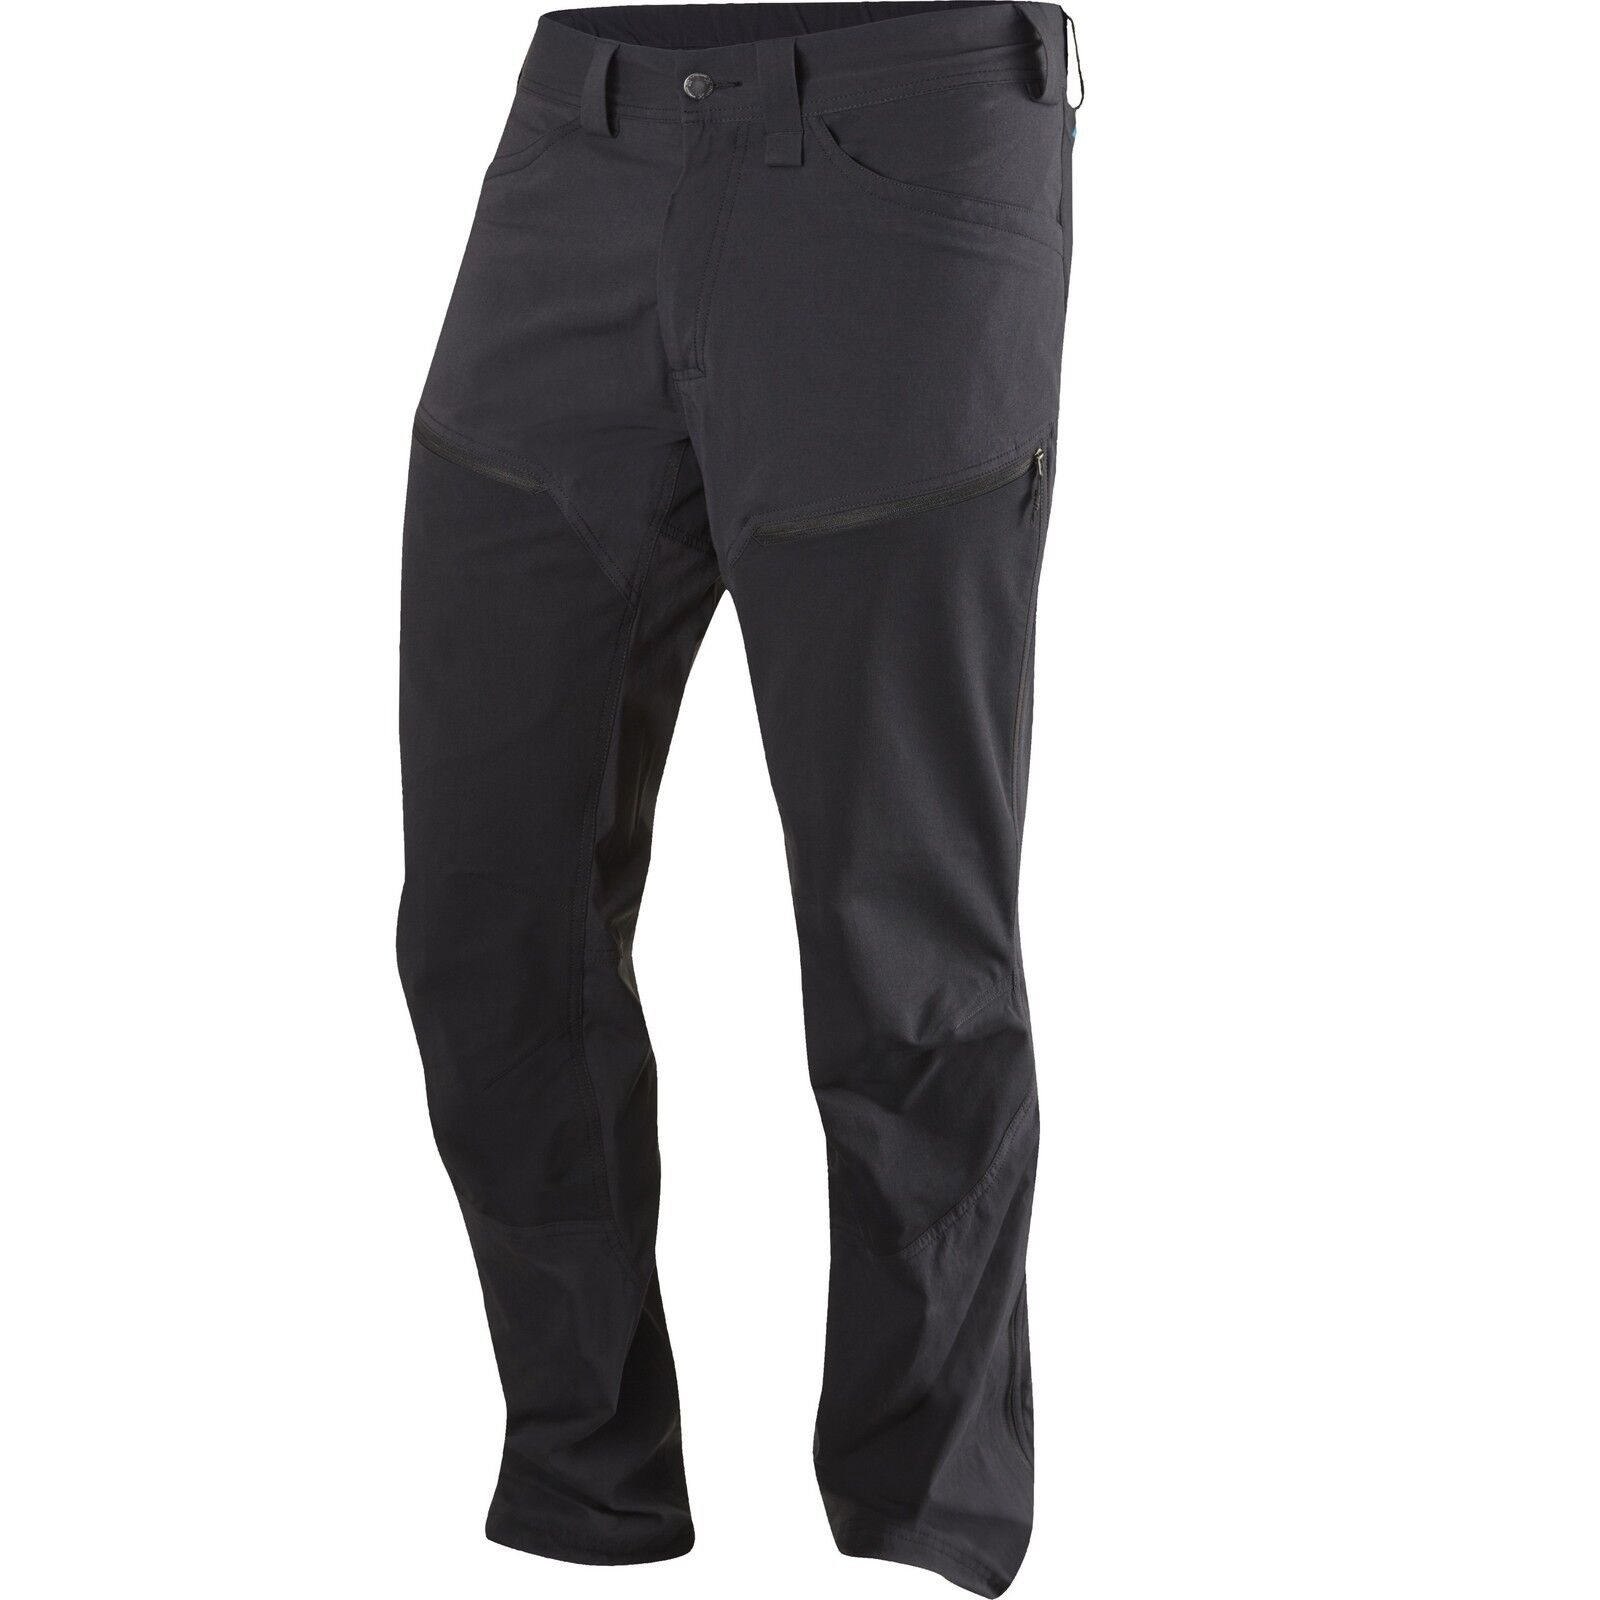 Haglöfs Medio Flex Pantalón Corto Talla Senderismo Pantalones para Hombres Negro